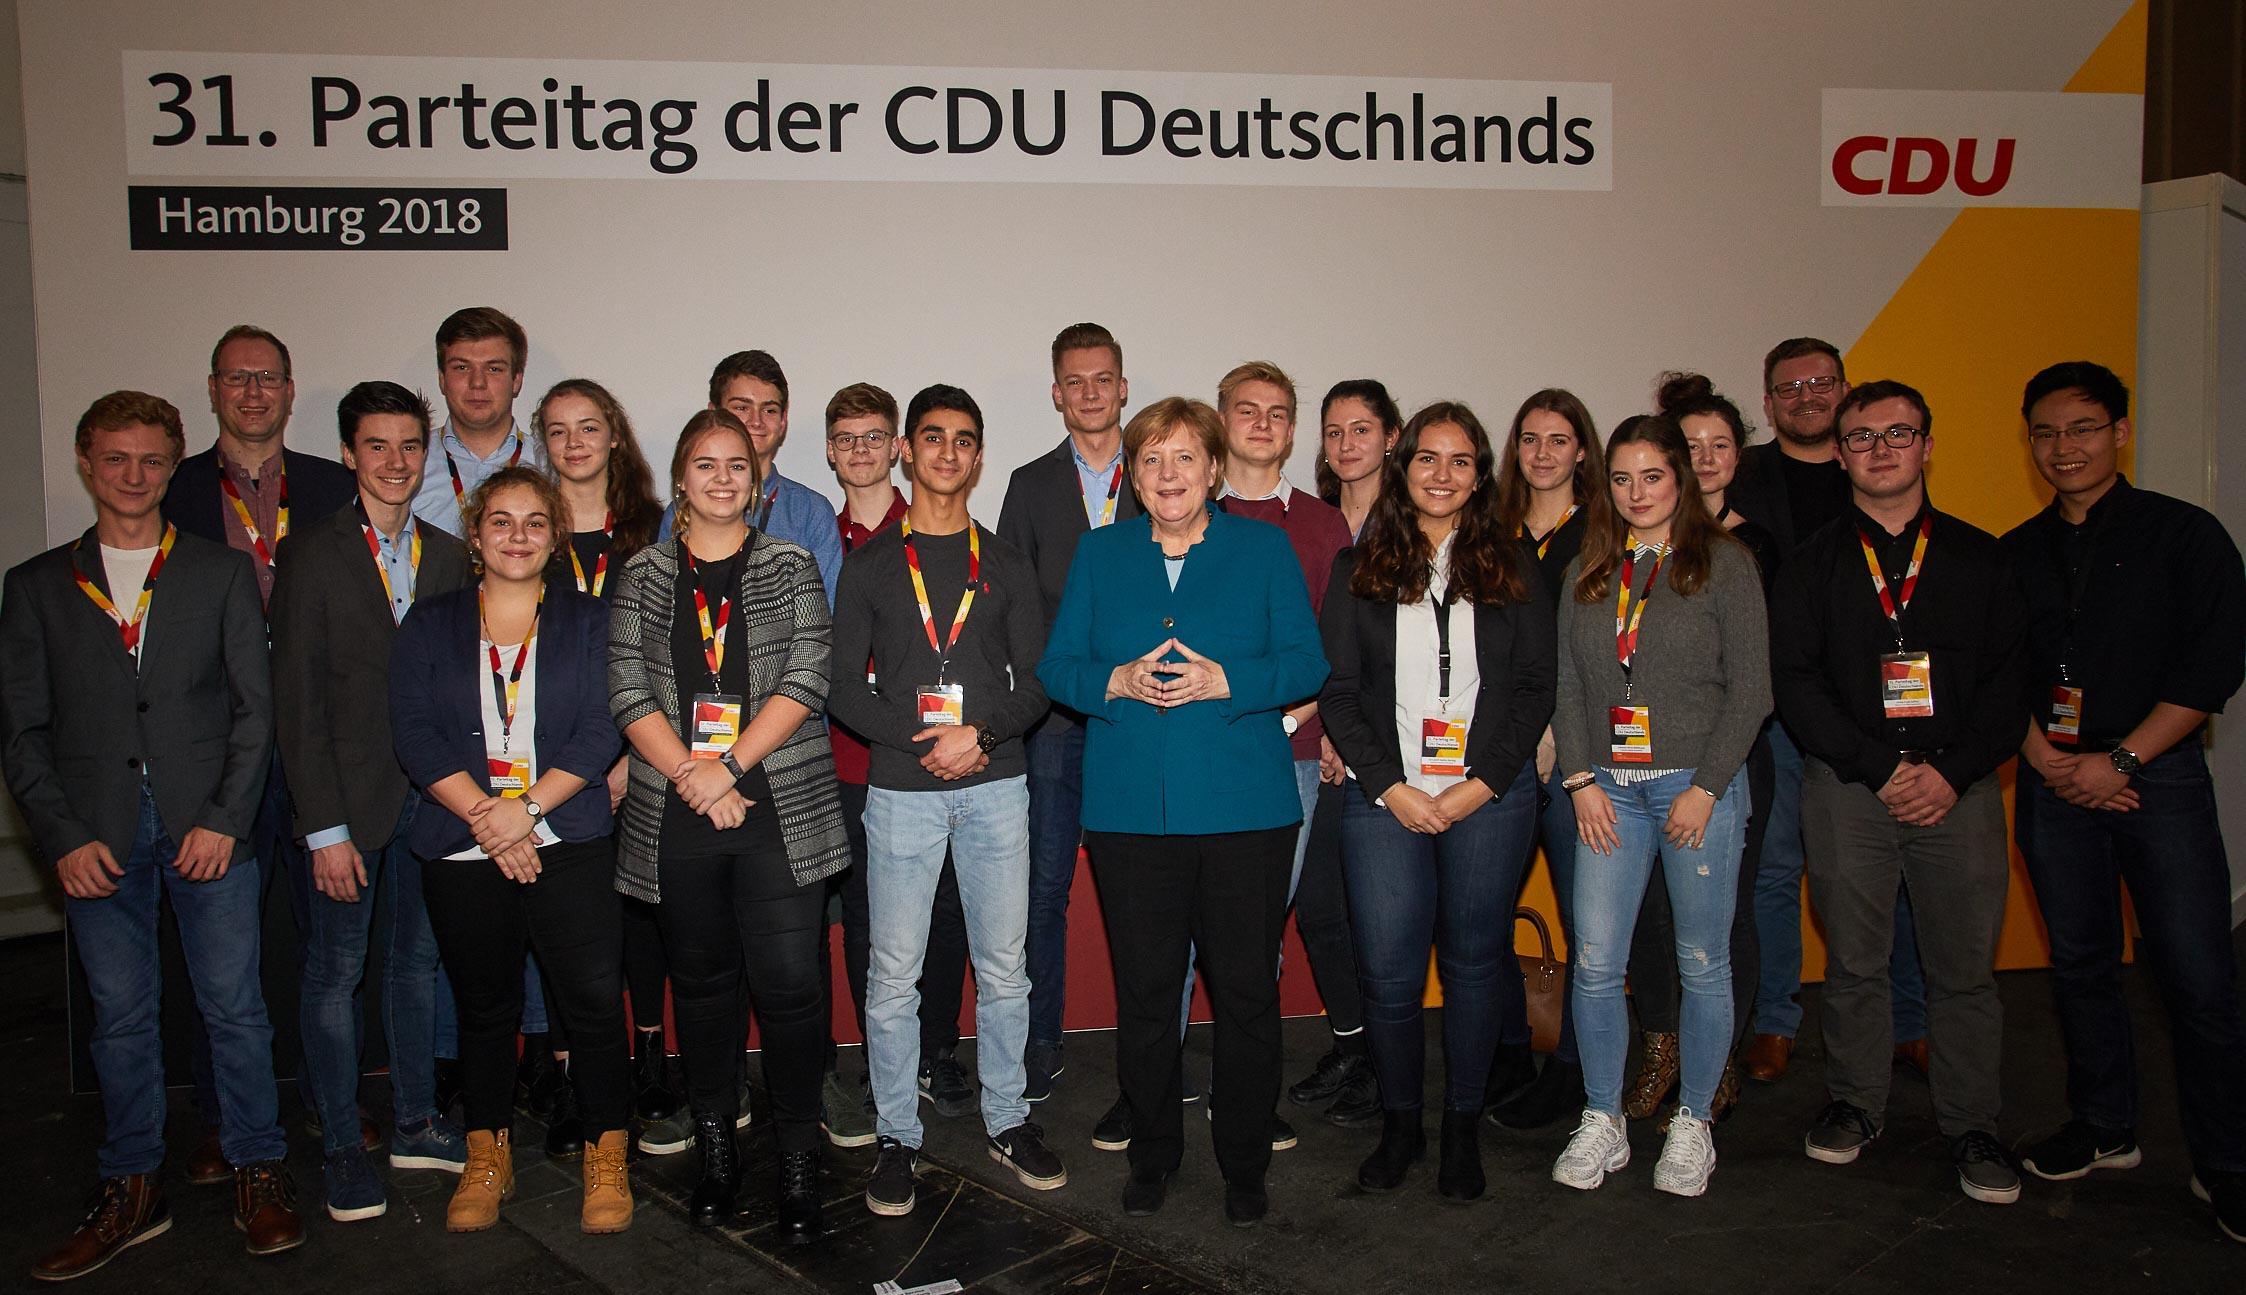 (c) CDU/Laurence Chaperon